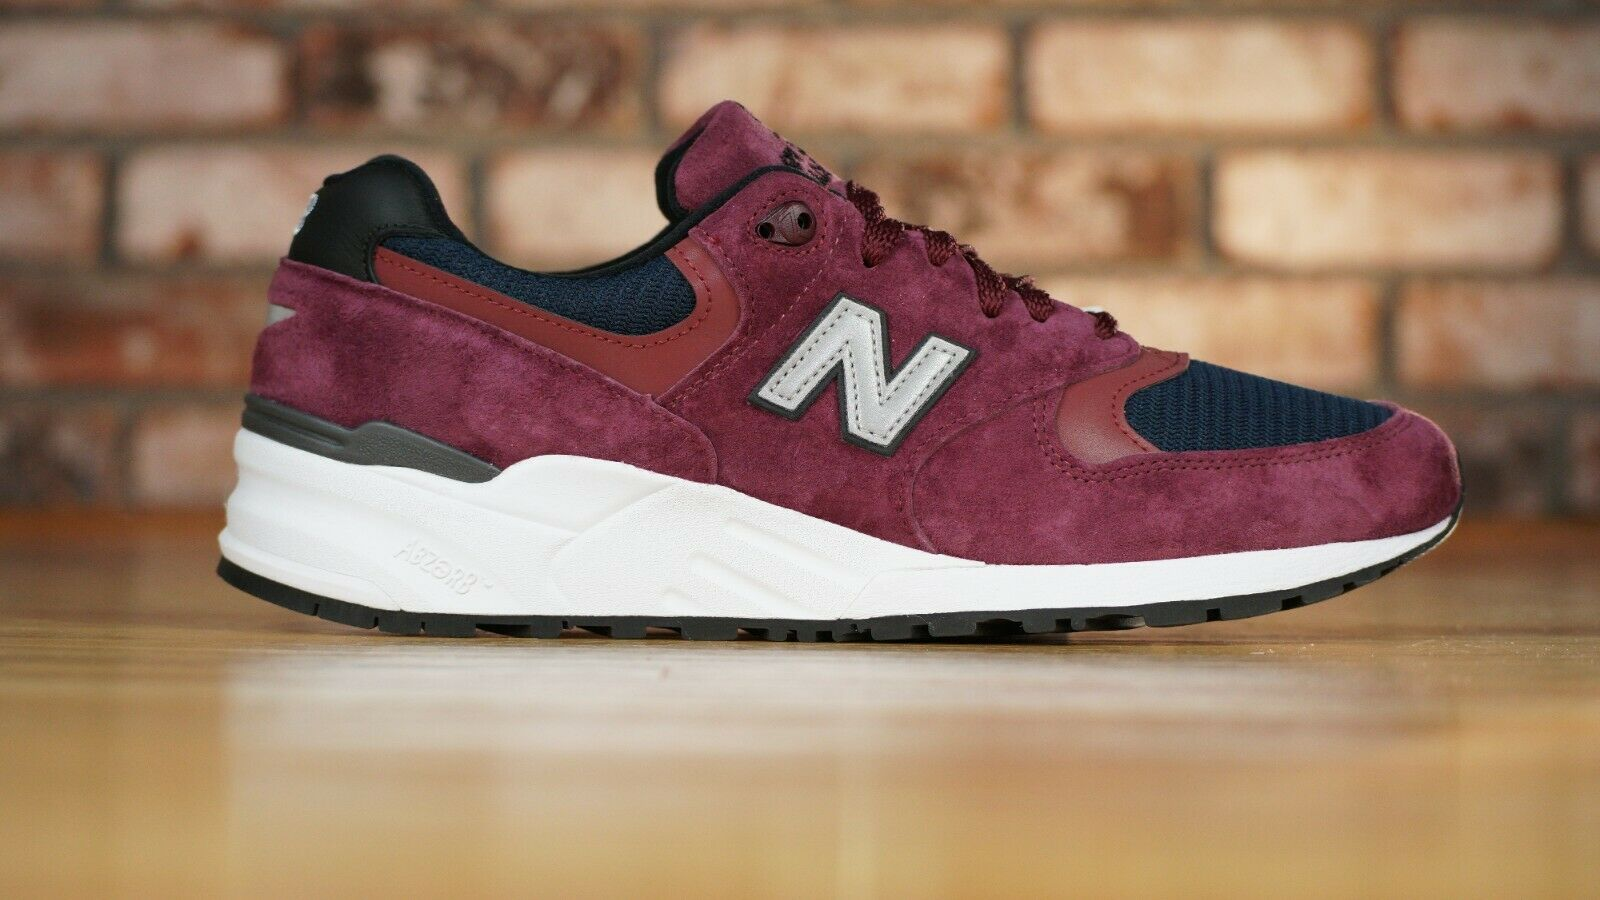 999 Marrón Azul Marino New Balance Hecho en EE. UU. Zapatos para correr M999JTA para hombres D